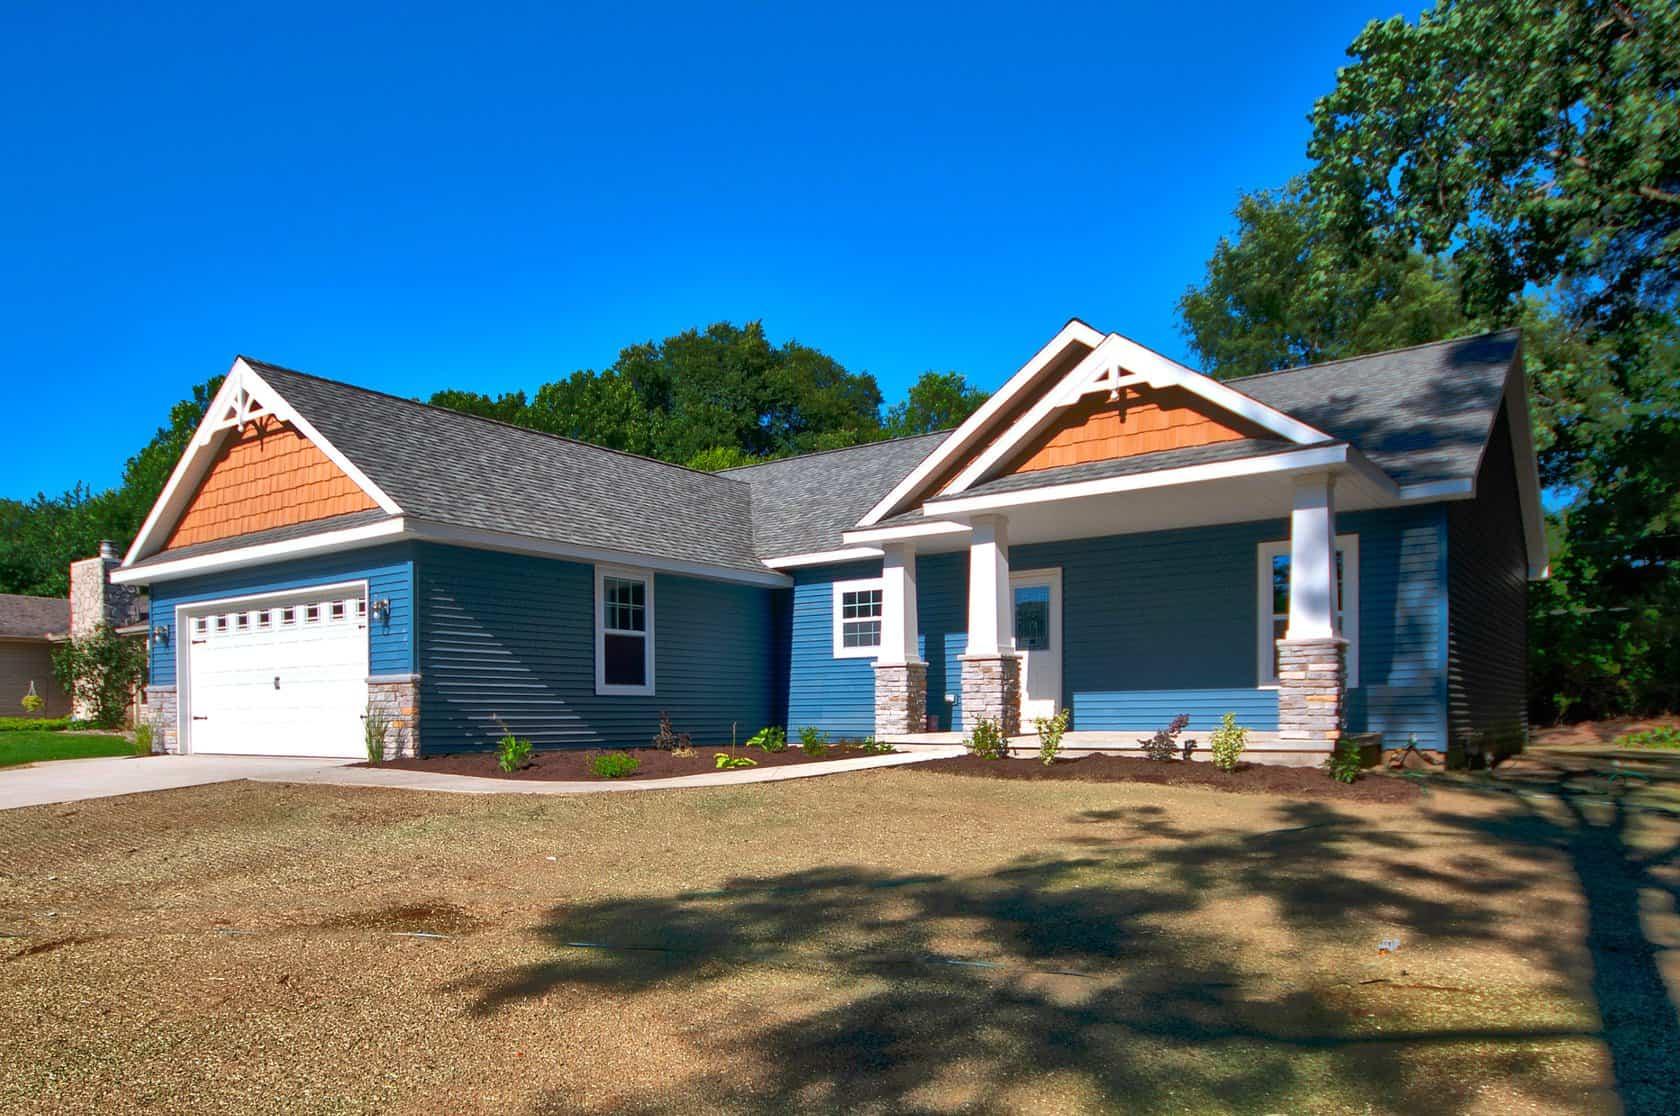 custom ranch modular home elkhart indiana walnut trails 1 32 next modular. Black Bedroom Furniture Sets. Home Design Ideas